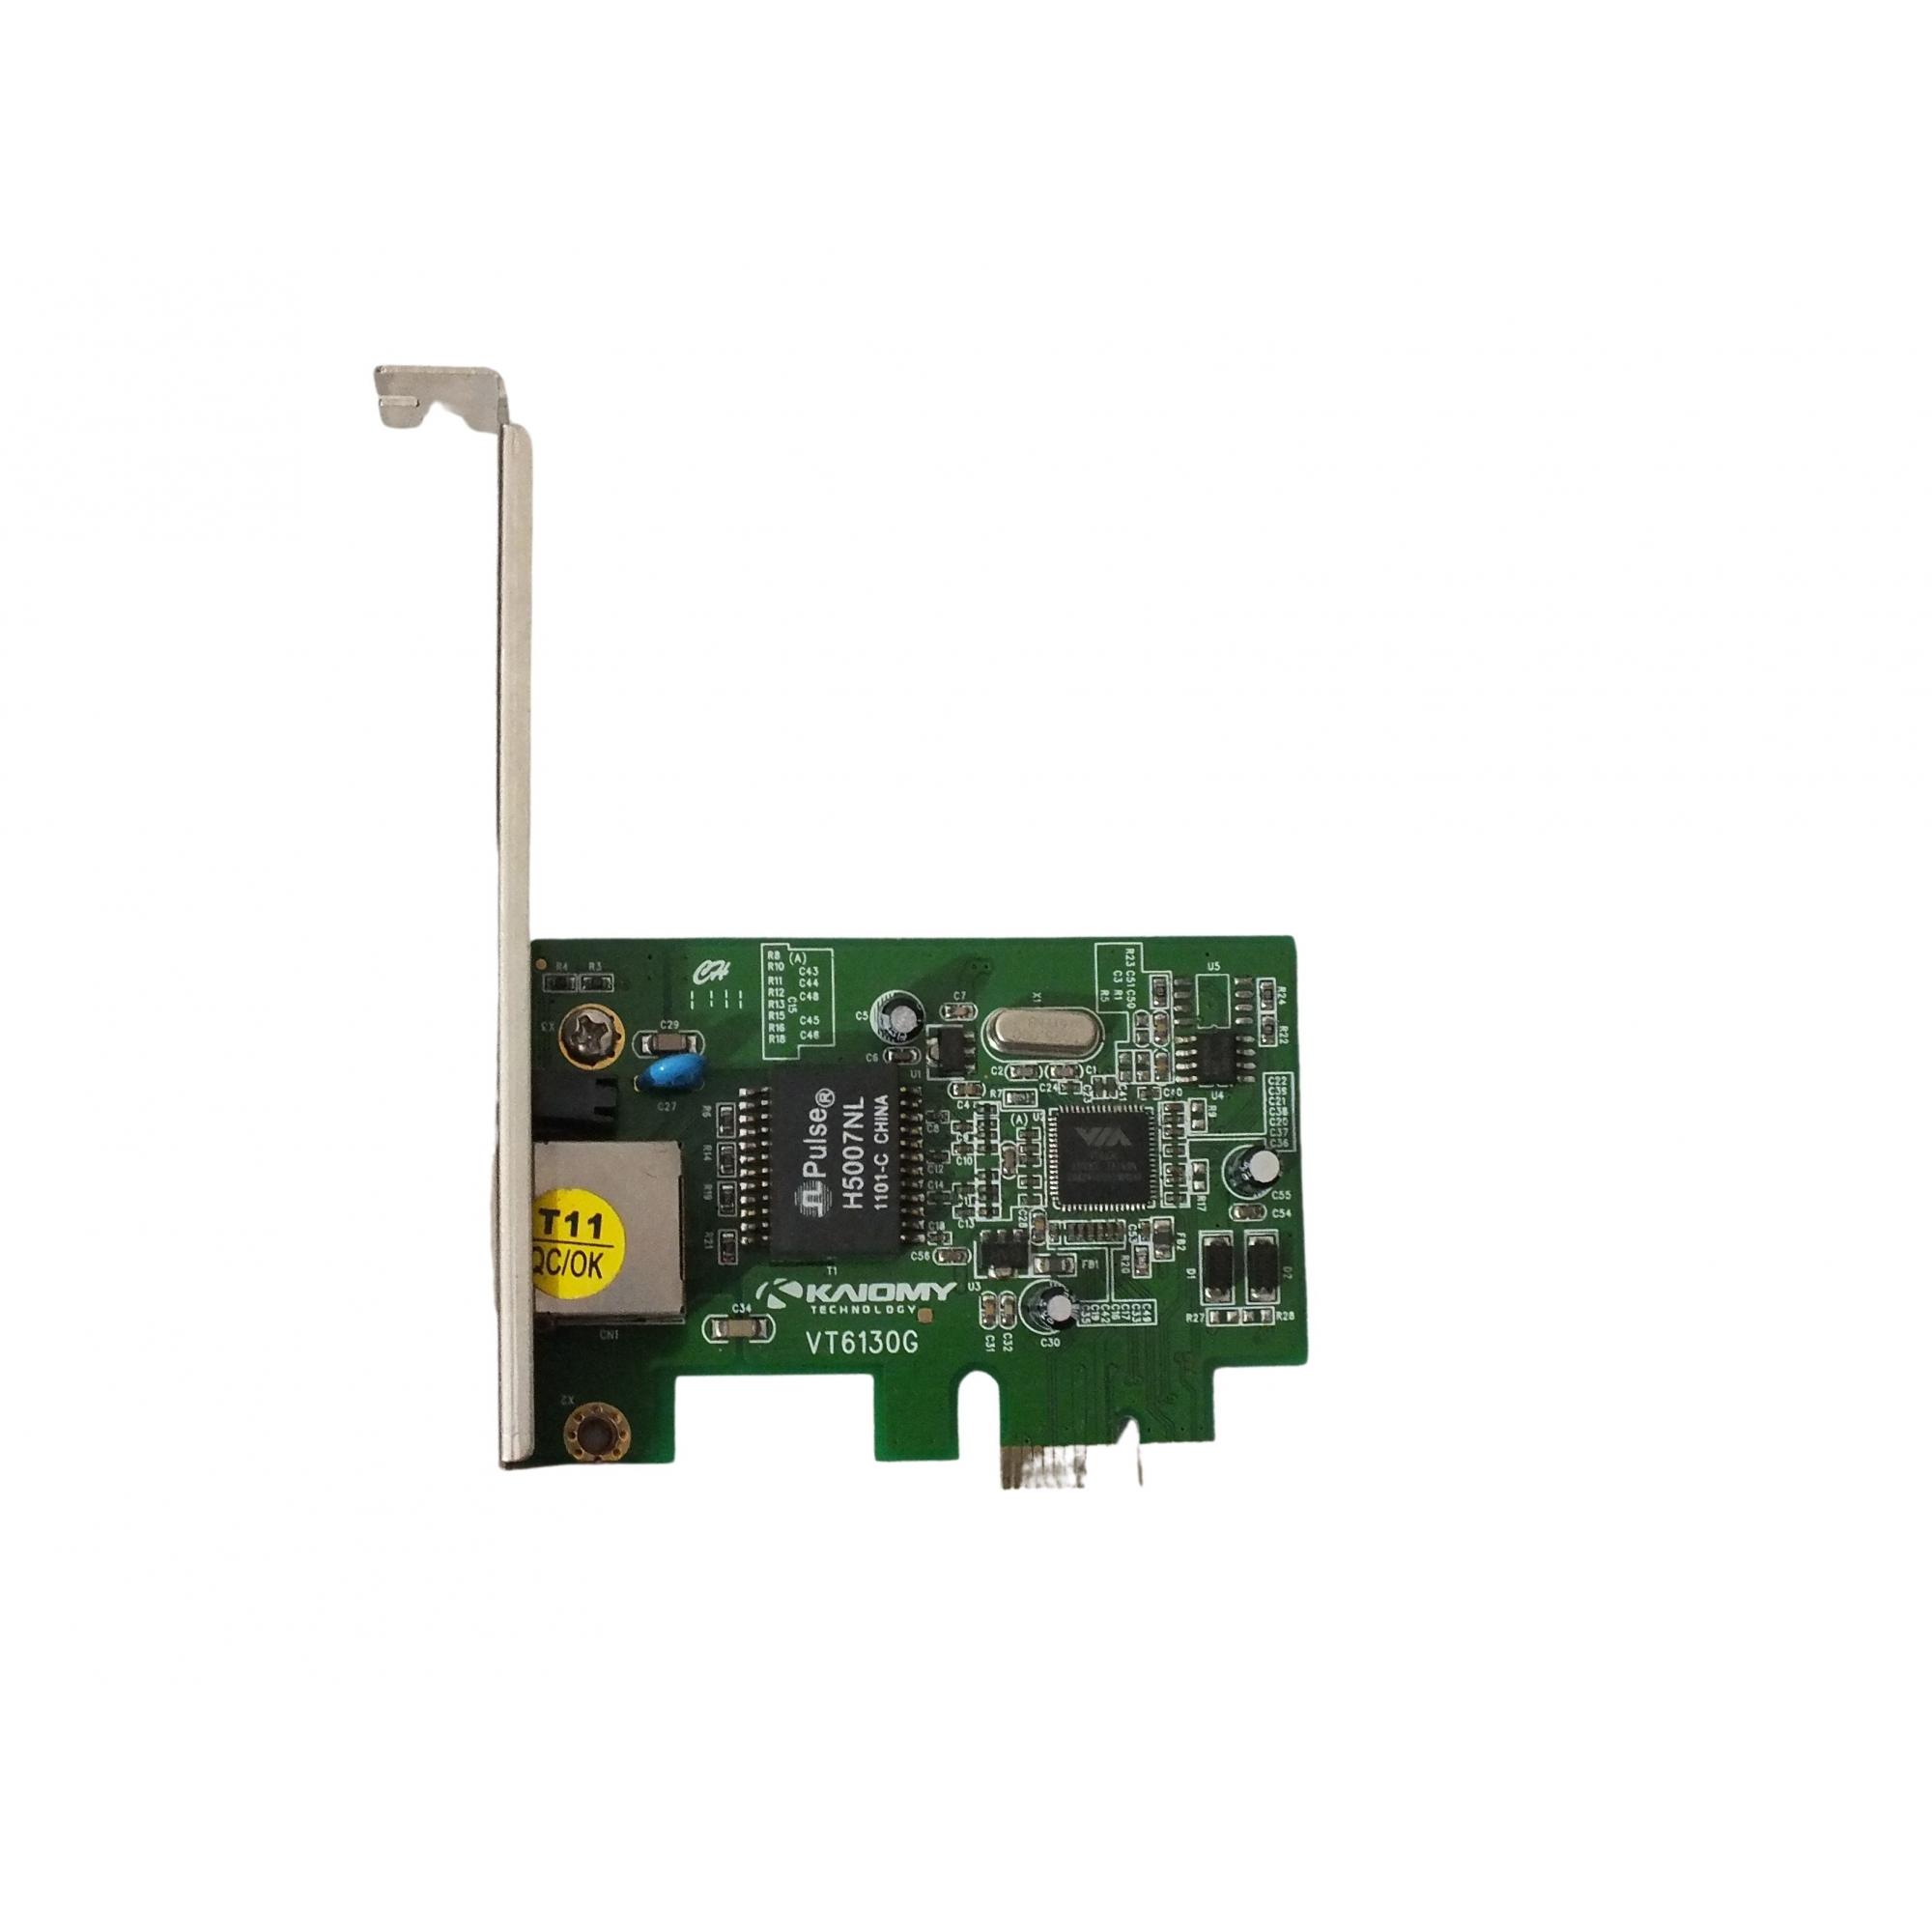 Placa De Rede Gigabit 10/100/1000 Mb/s Pci Express Rj45